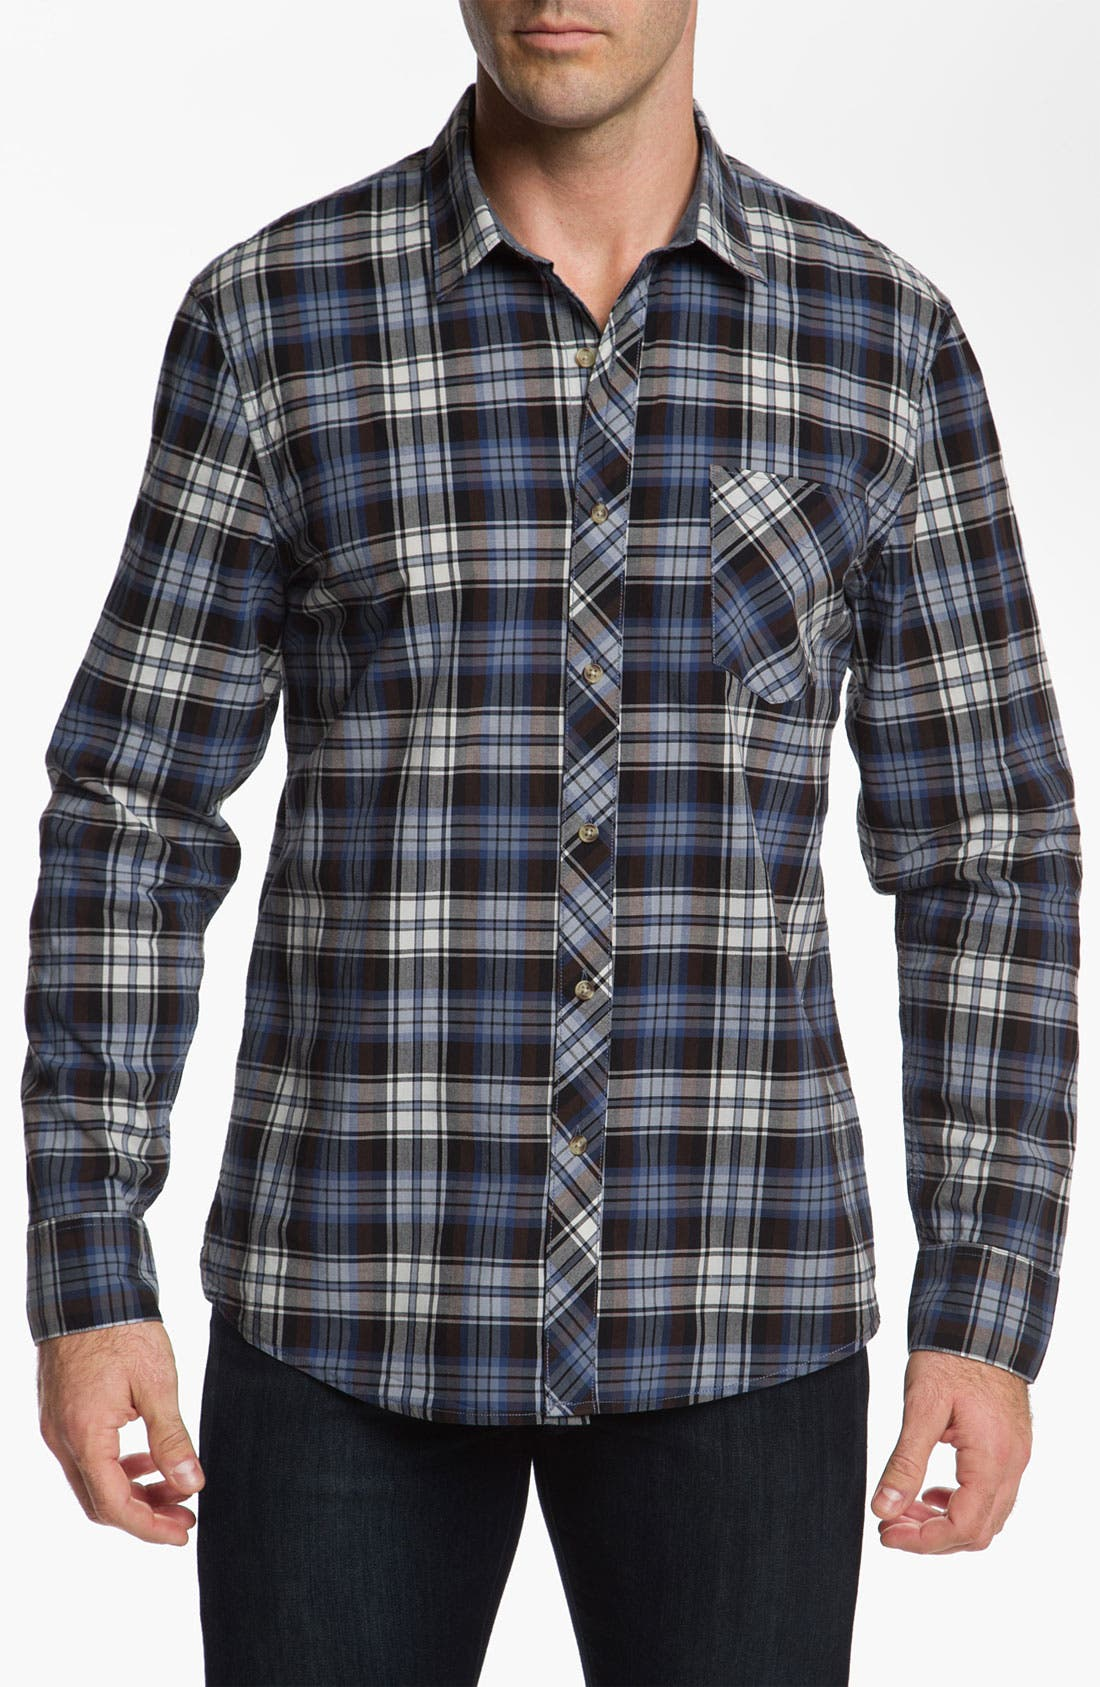 Alternate Image 1 Selected - 1901 Plaid Cotton Poplin Shirt